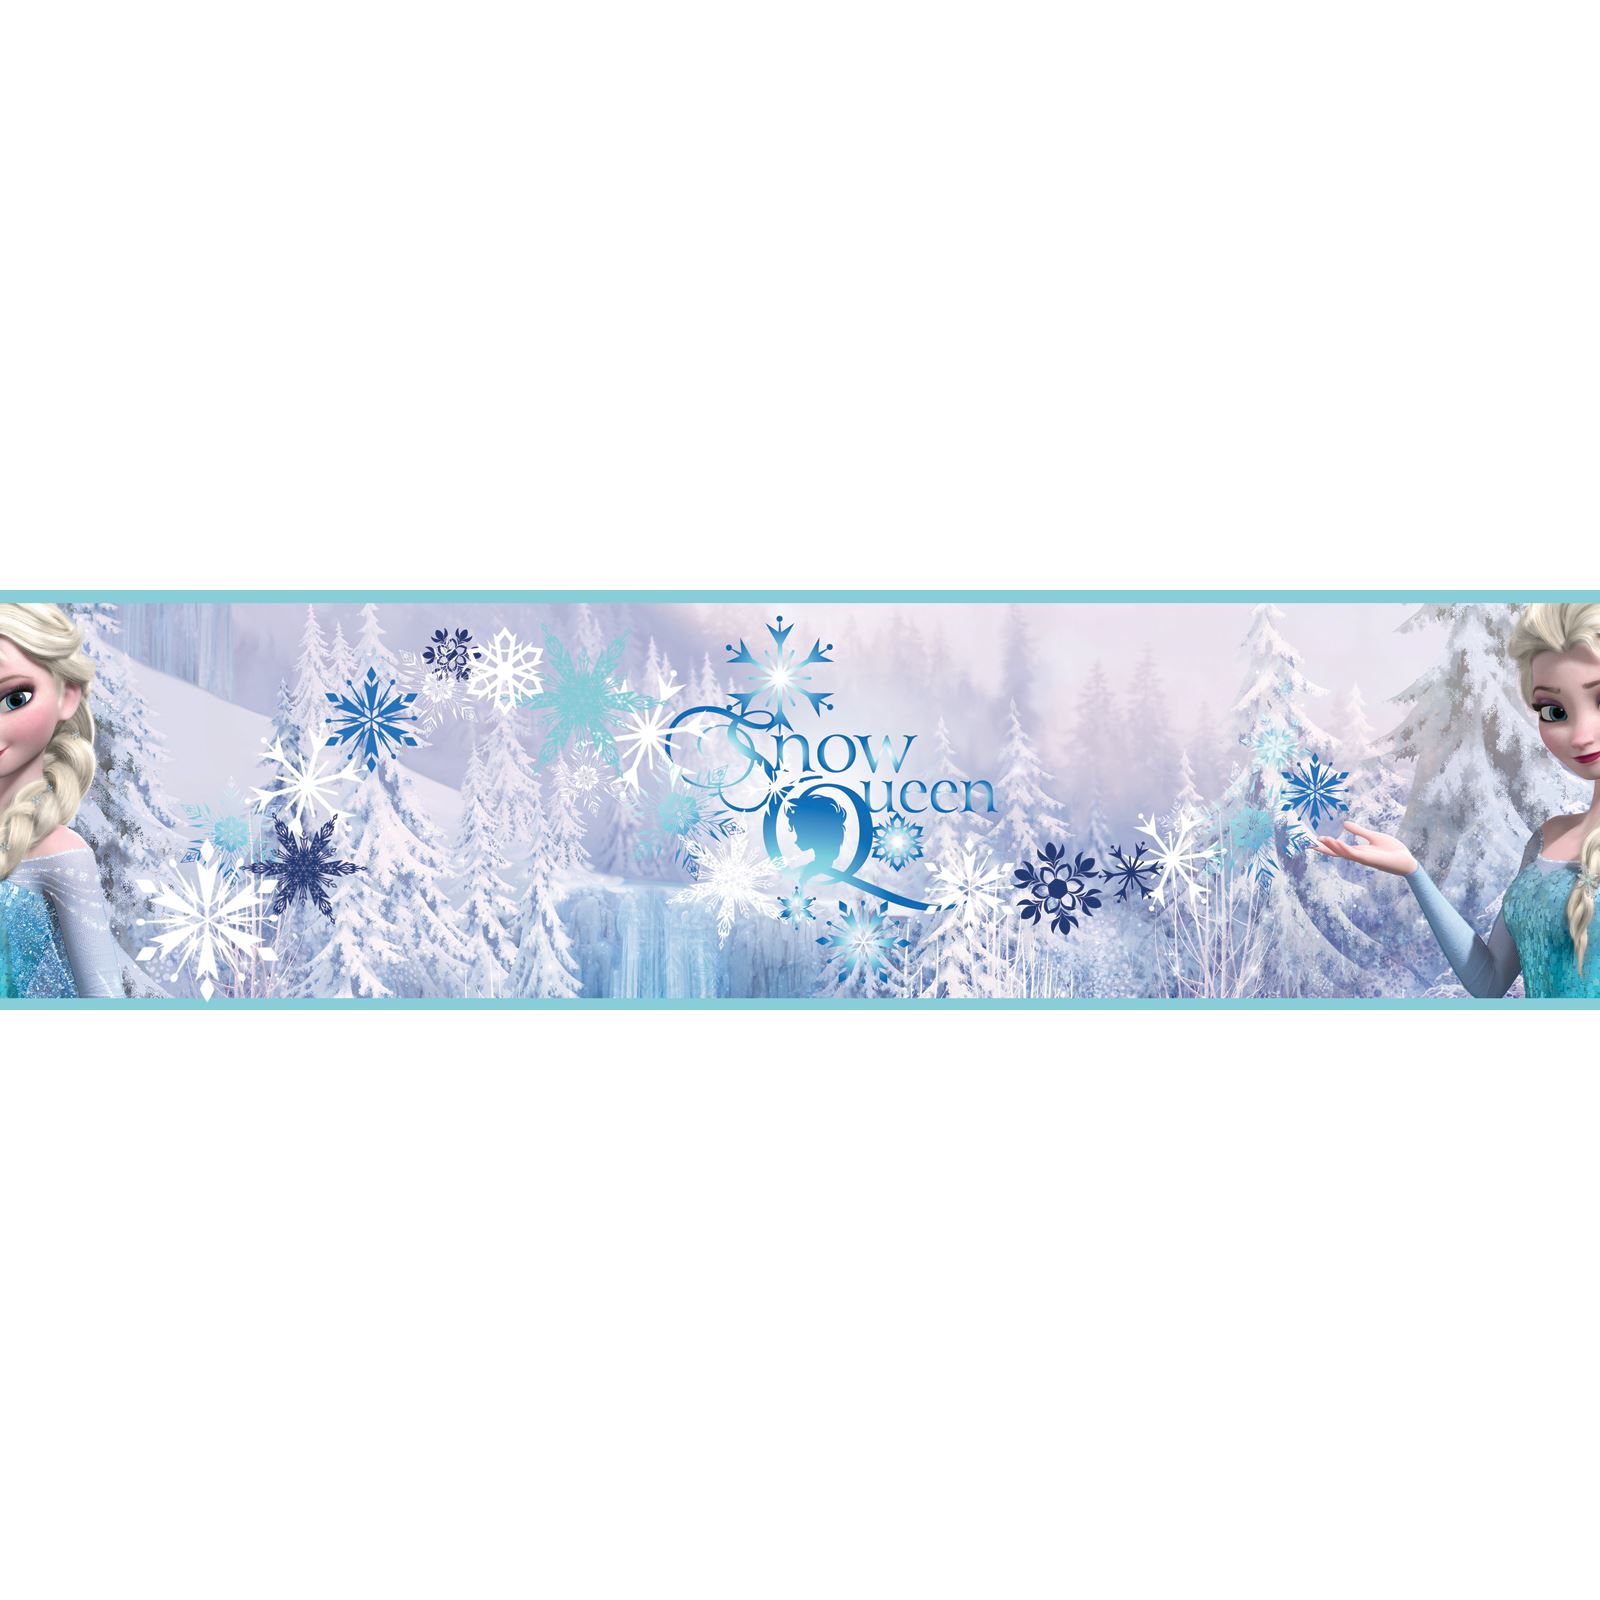 Disney Frozen Wallpaper Borders And Wall Stickers Wall D Cor Ebay